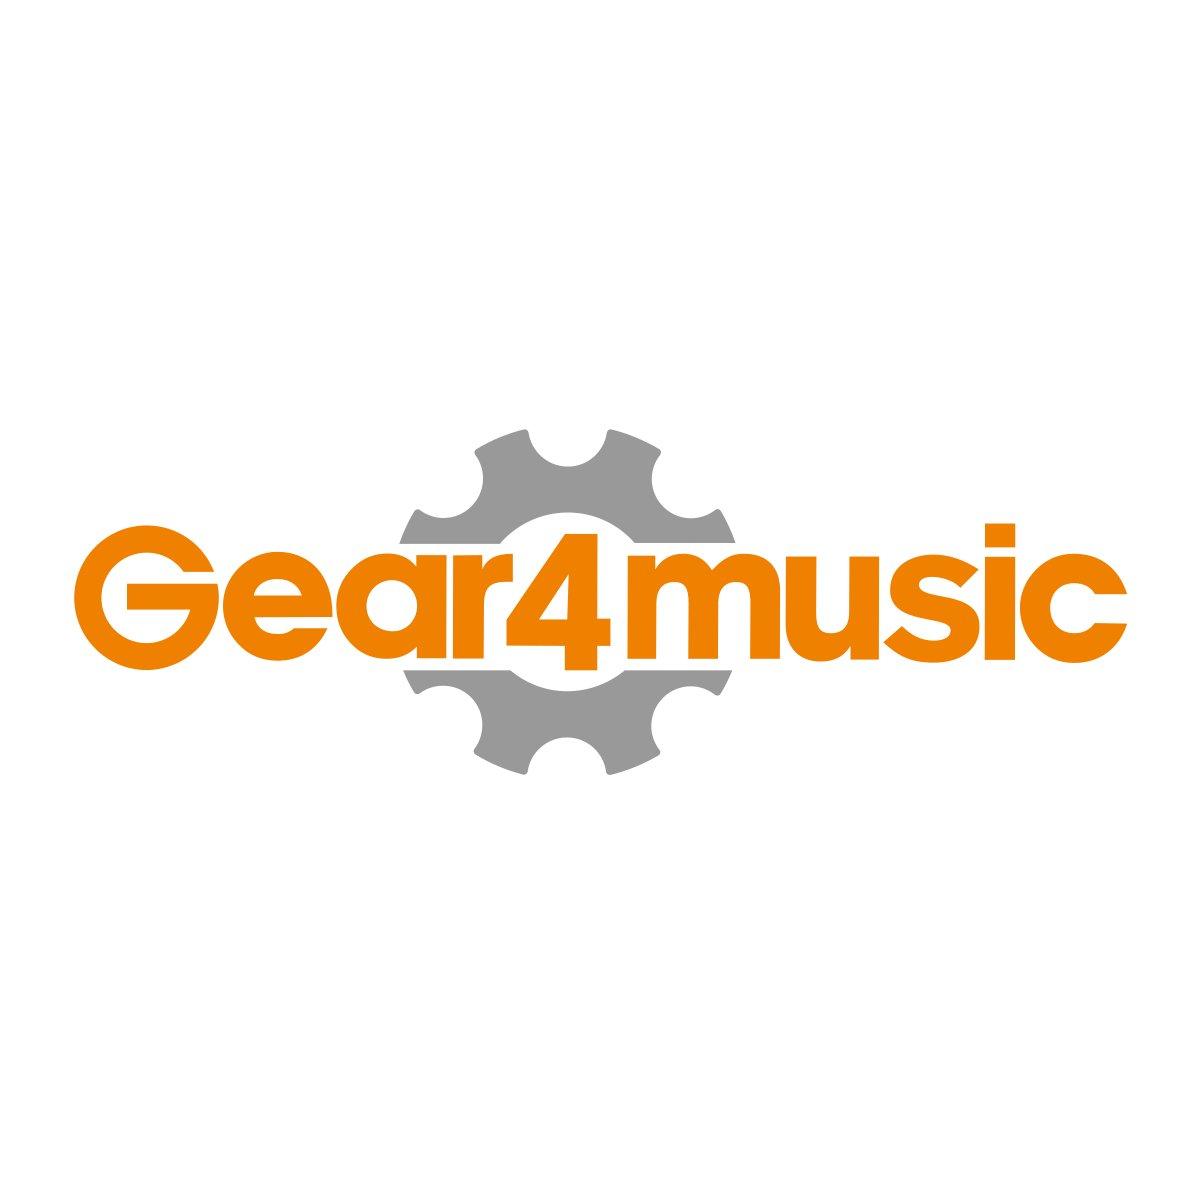 Fine Studio Equipment Recording Gear4Music Largest Home Design Picture Inspirations Pitcheantrous